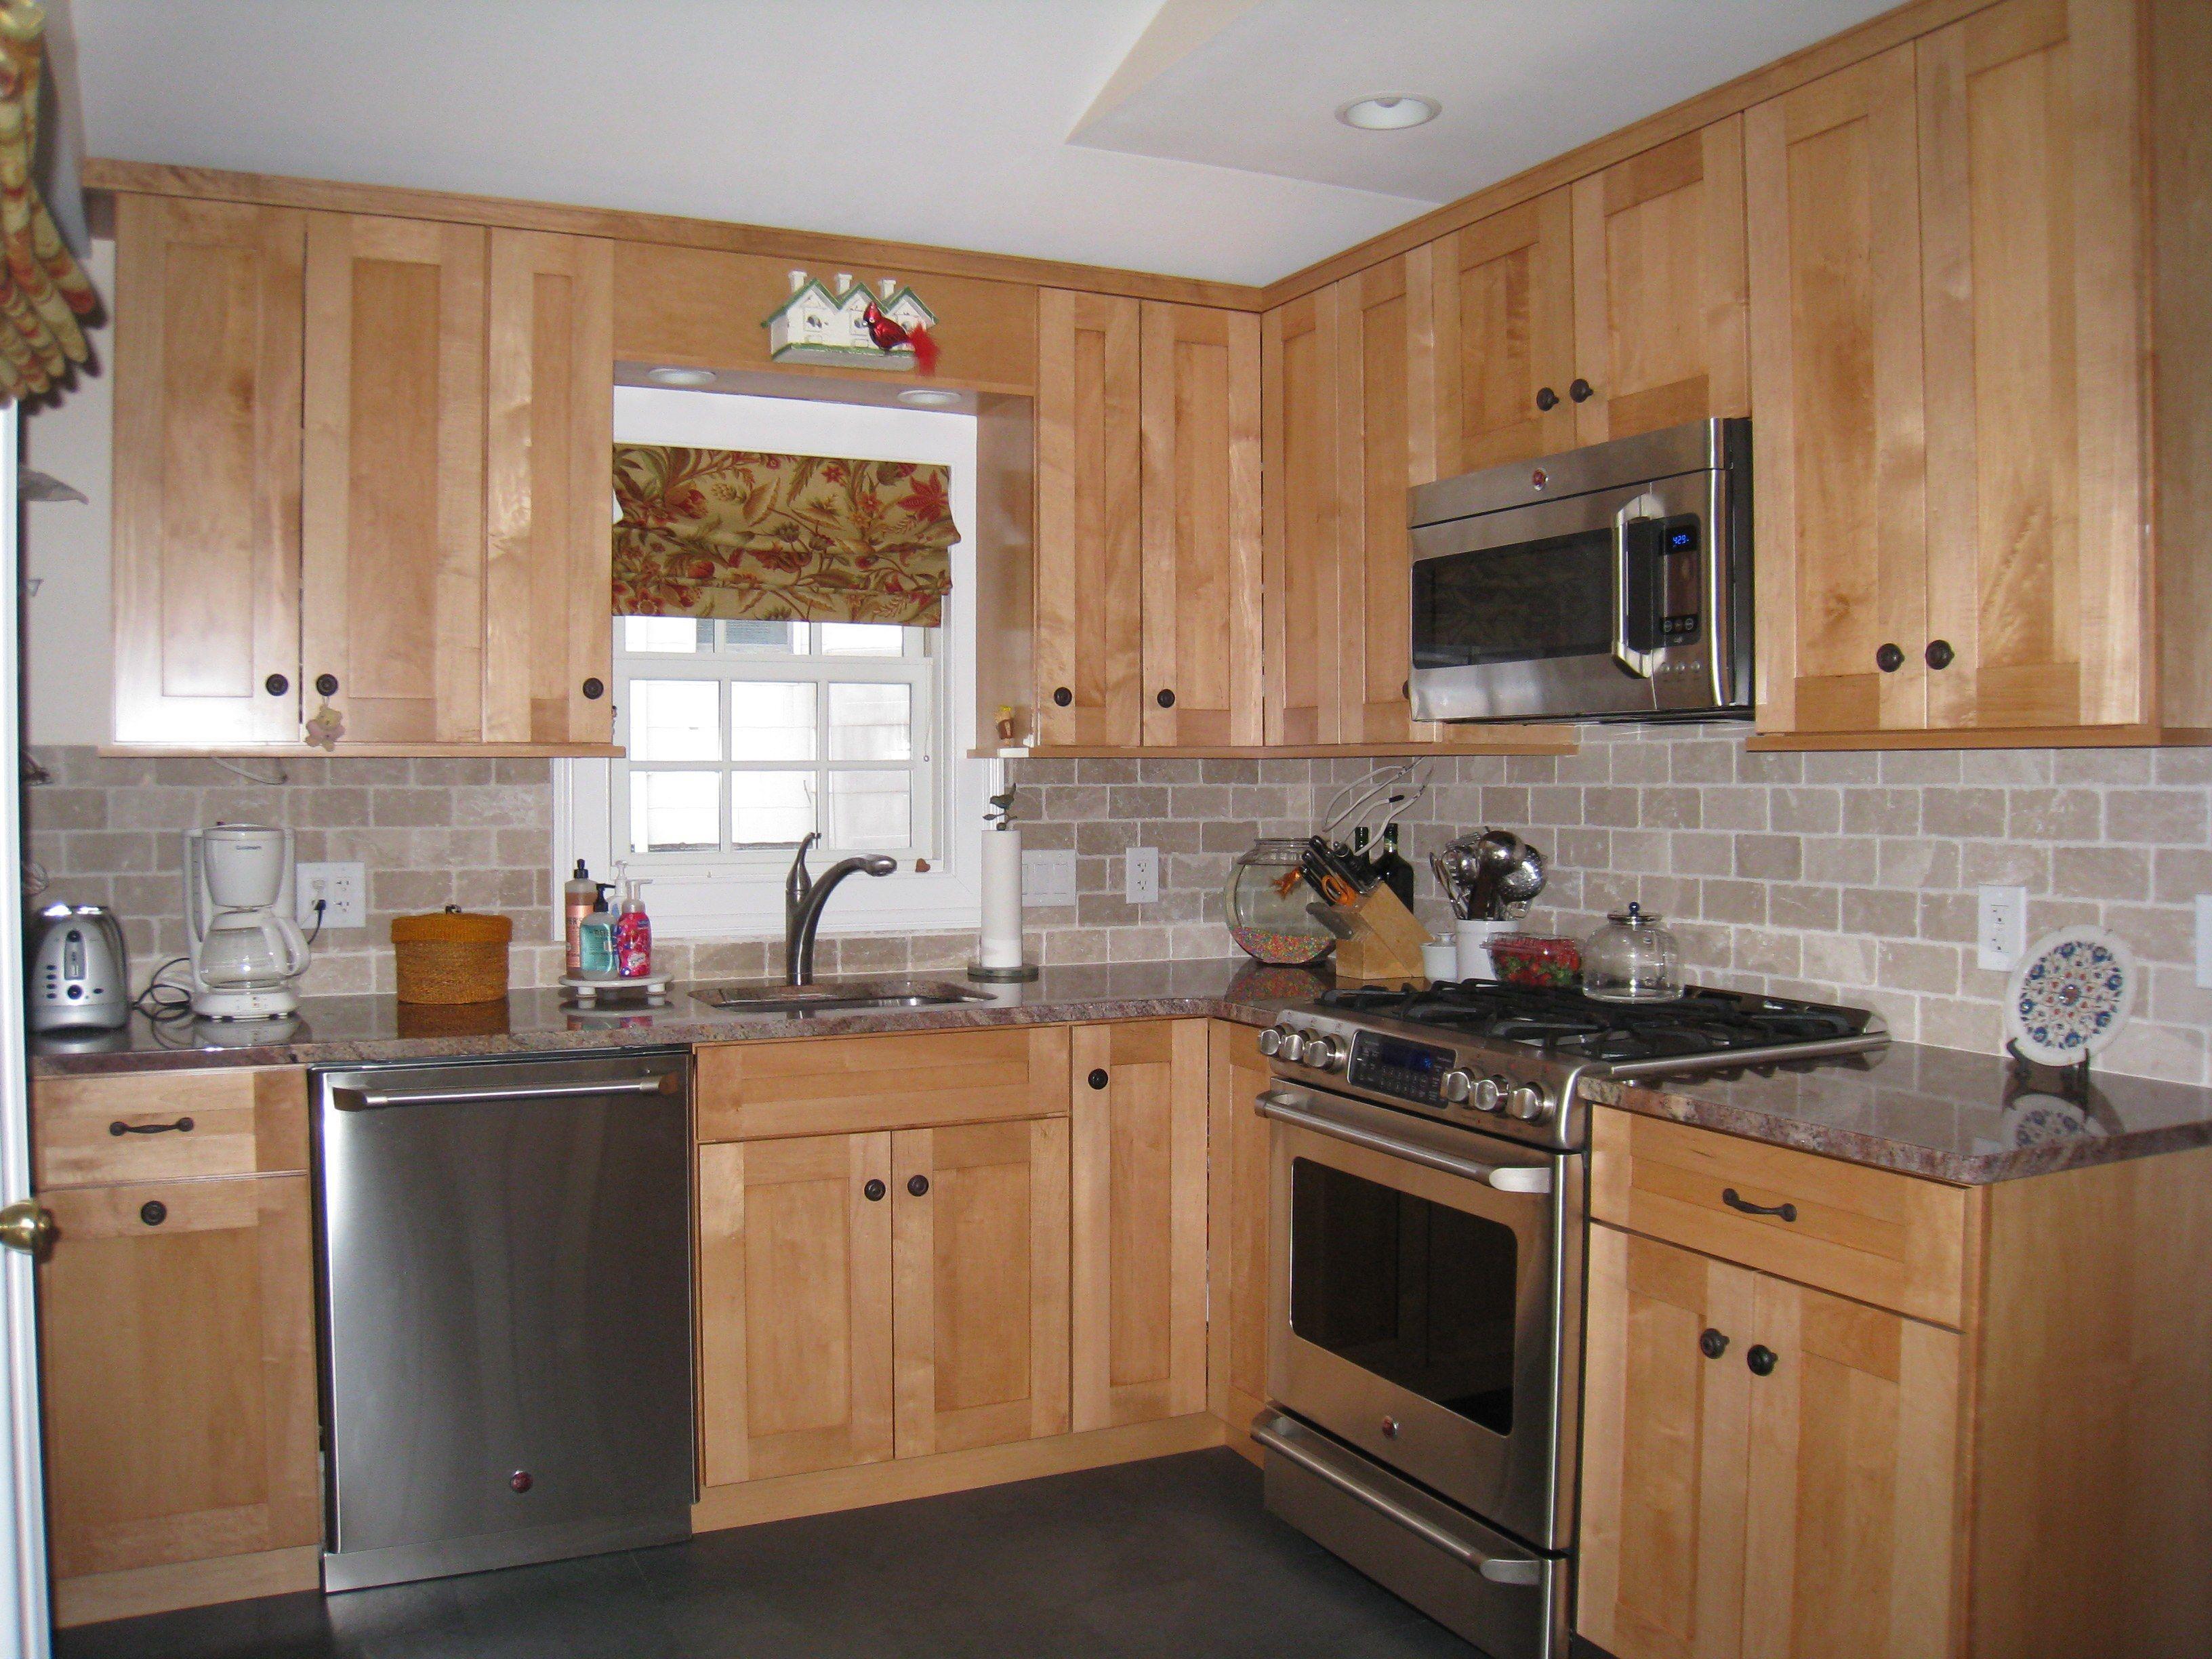 stone backsplash kitchen Kitchen Sophisticated Gray Granite Glass Subway Tile Backsplash With Unfinished Oak Kitchen Cabinet Set L Shaped Models As Decorate Rustic Kitchen